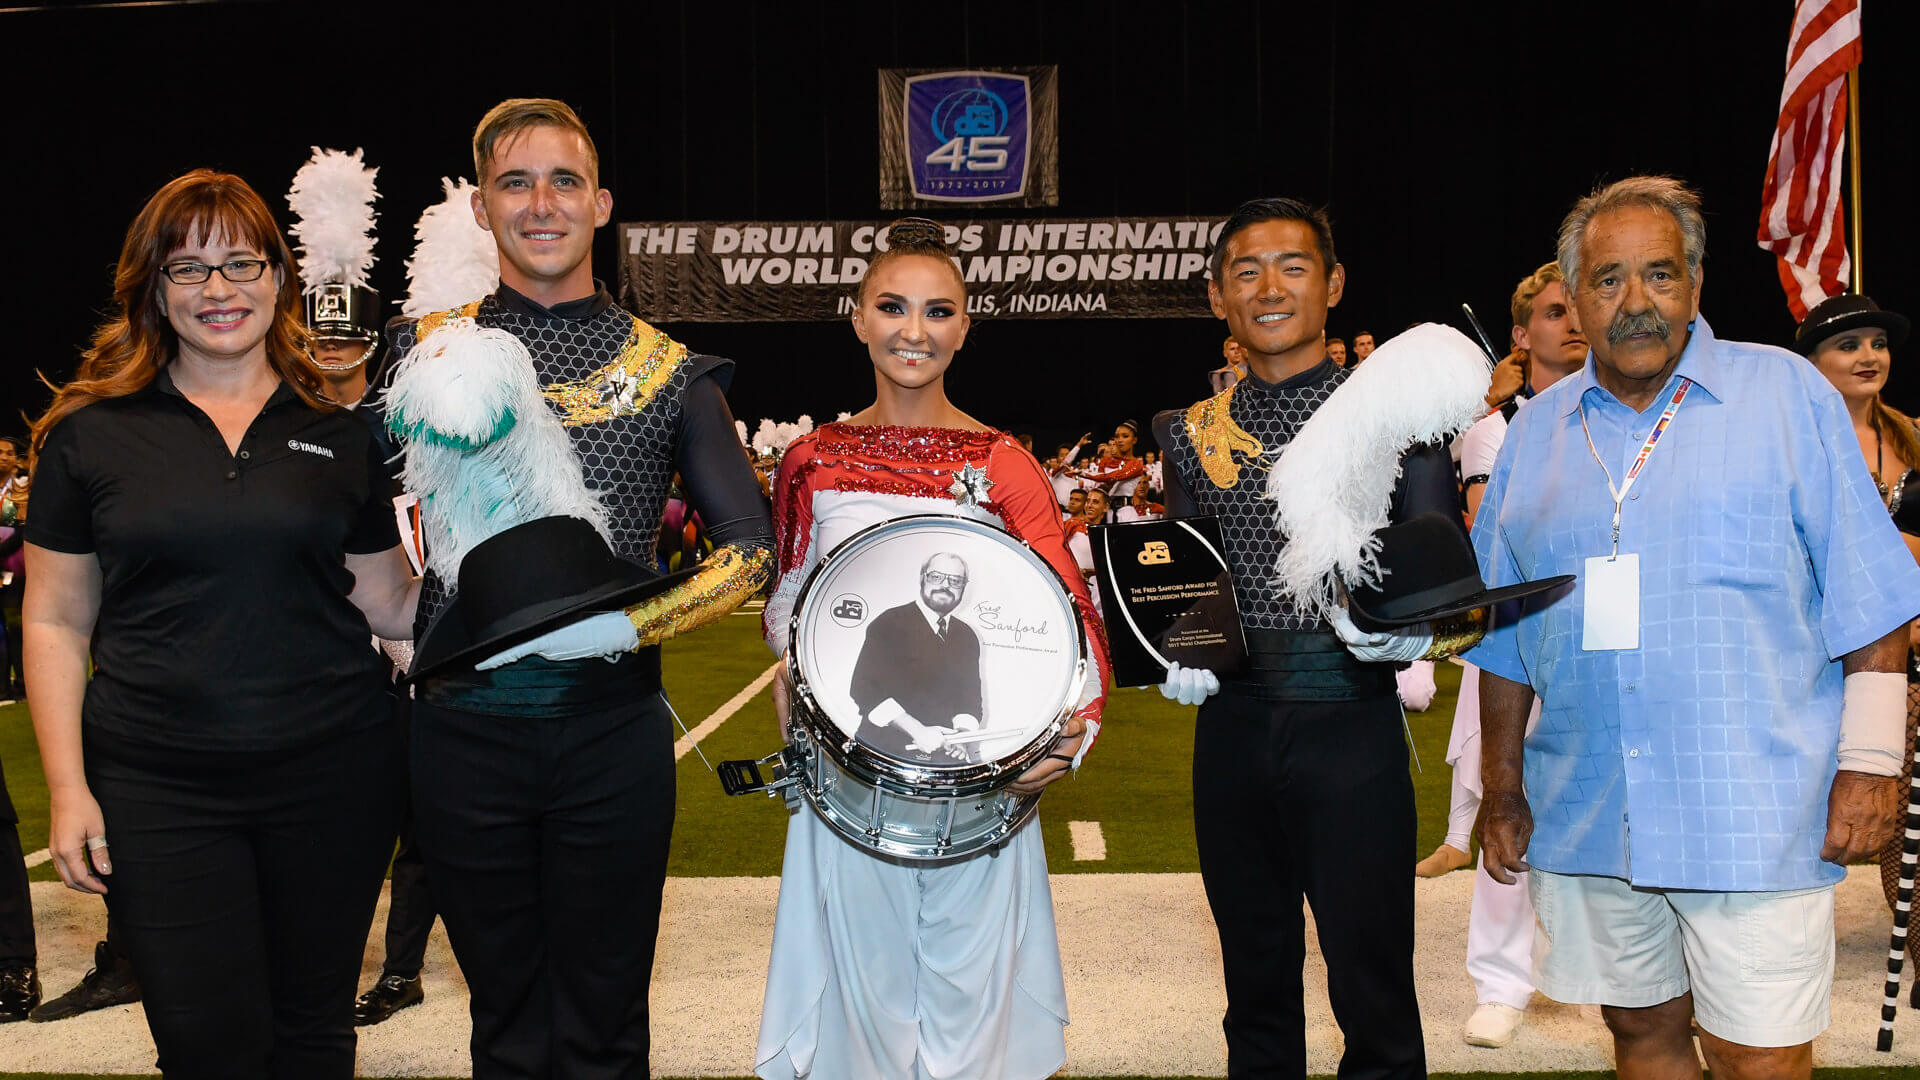 2017 DCI World Championship caption award winners